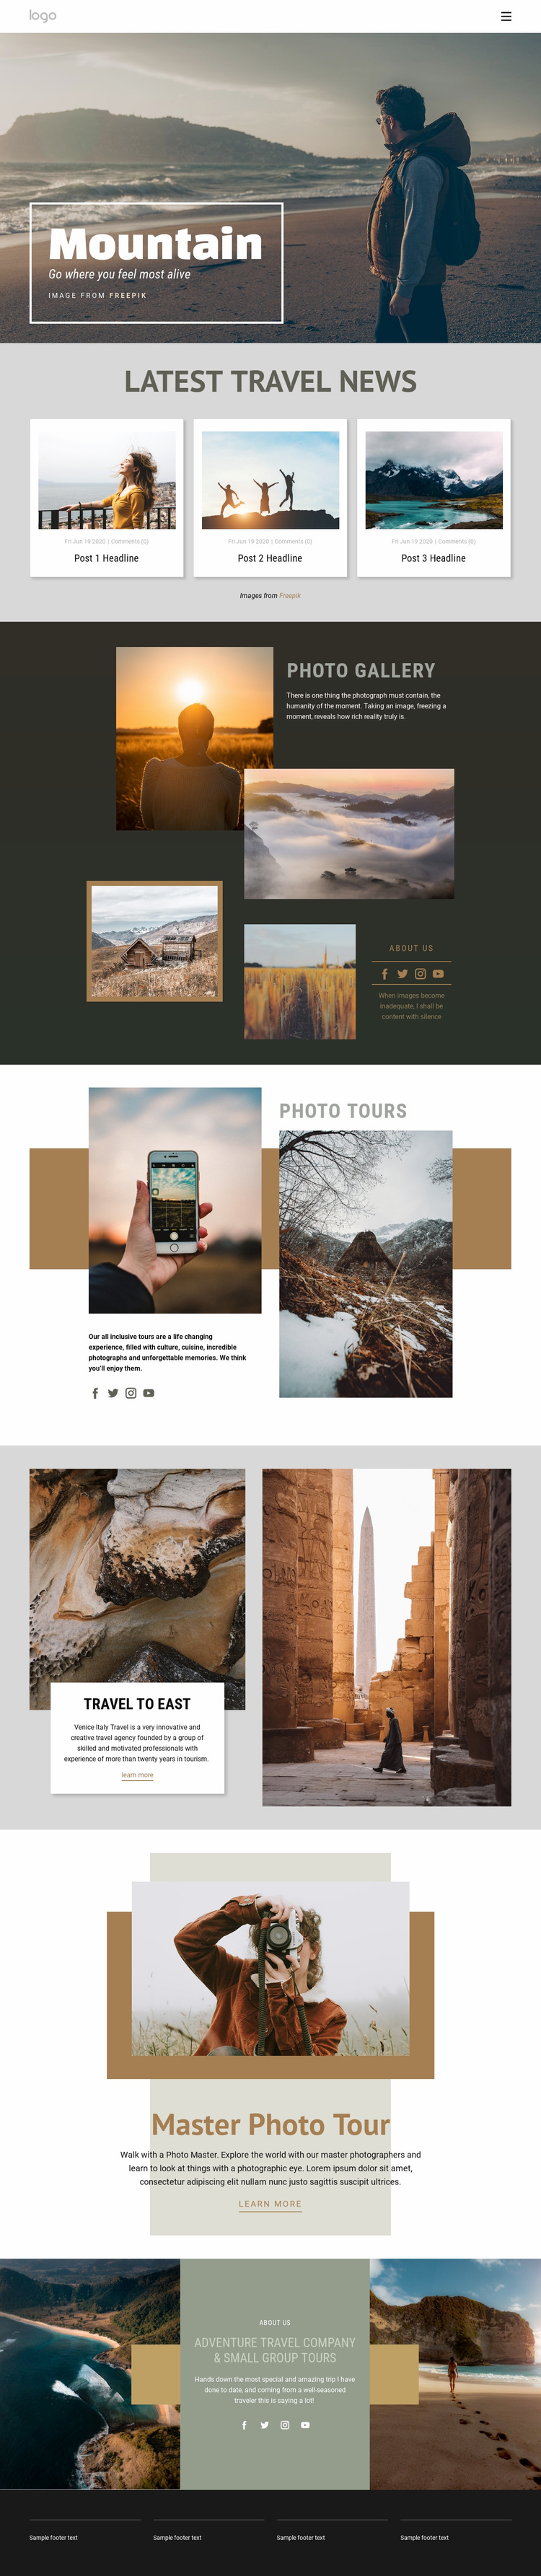 Mountain advanture travel Website Design